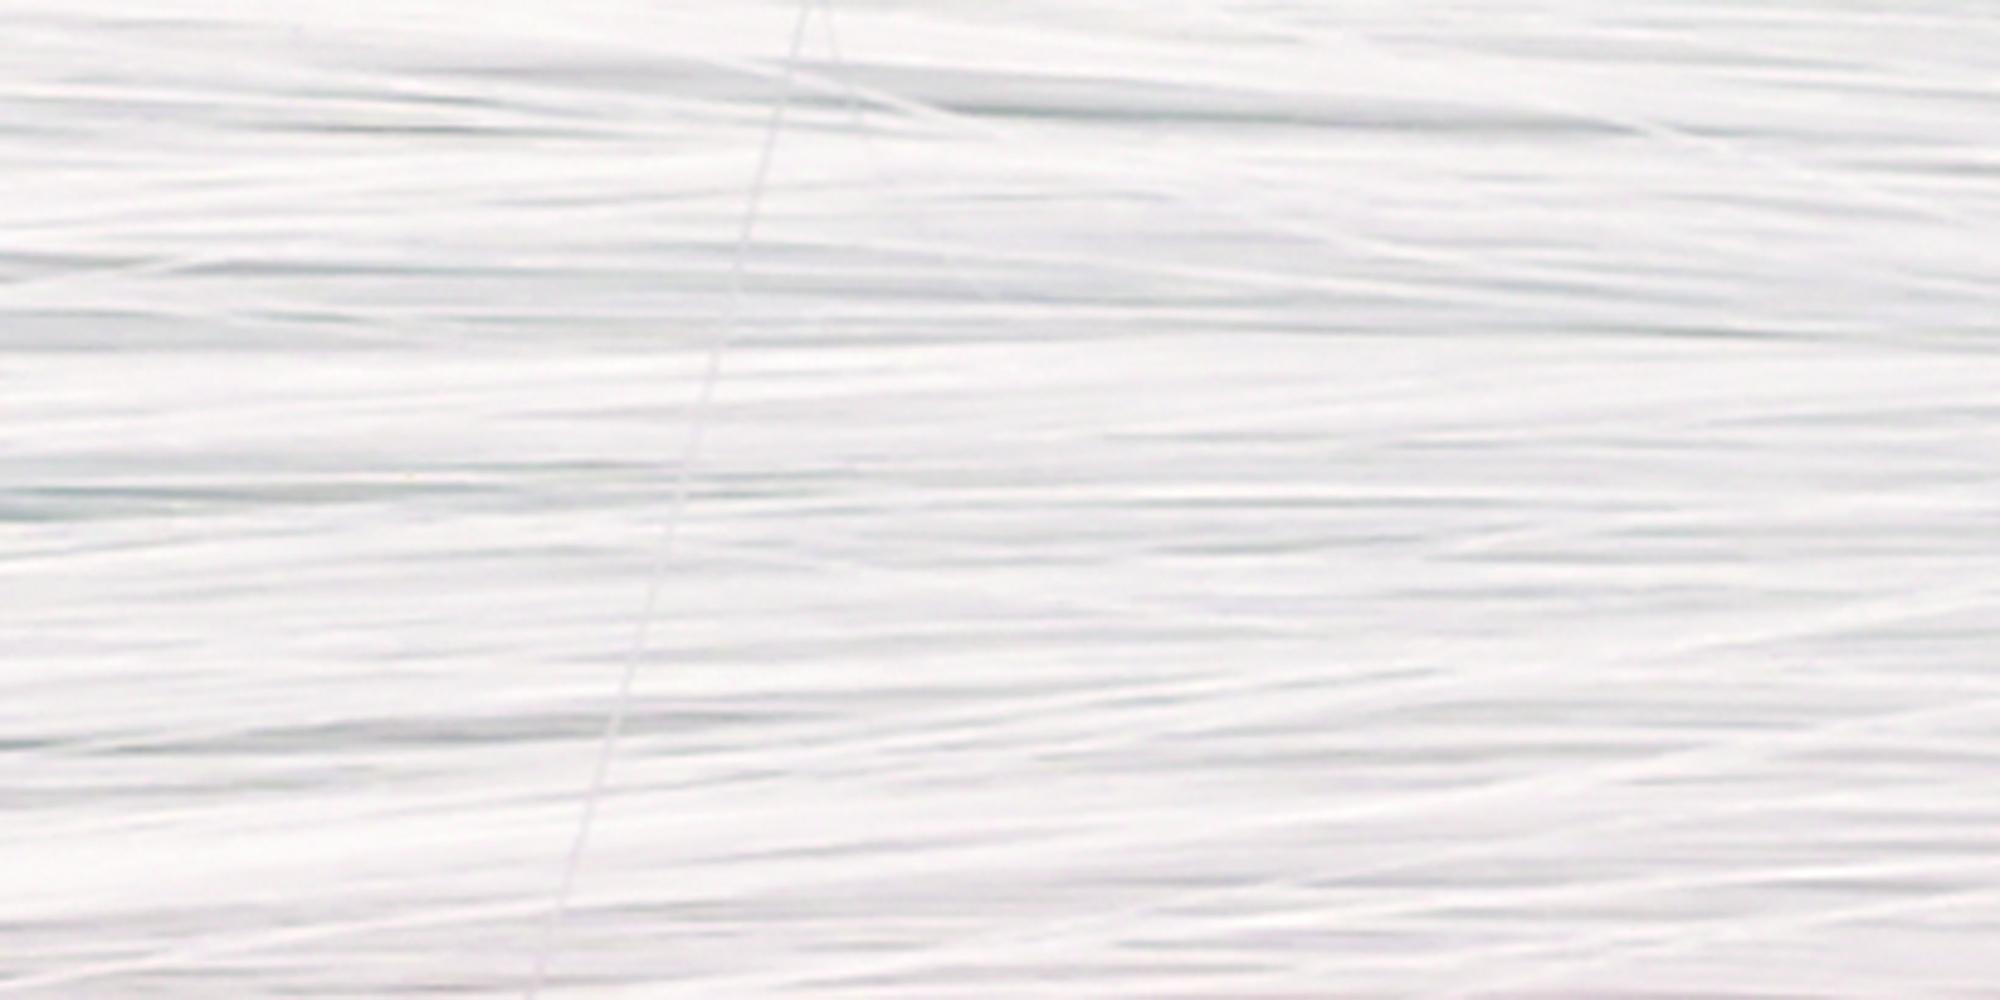 Stargazer-Baby-Hair-Extension-Synthetic-Clip-on-Streak-Various-Colors-43cm thumbnail 34